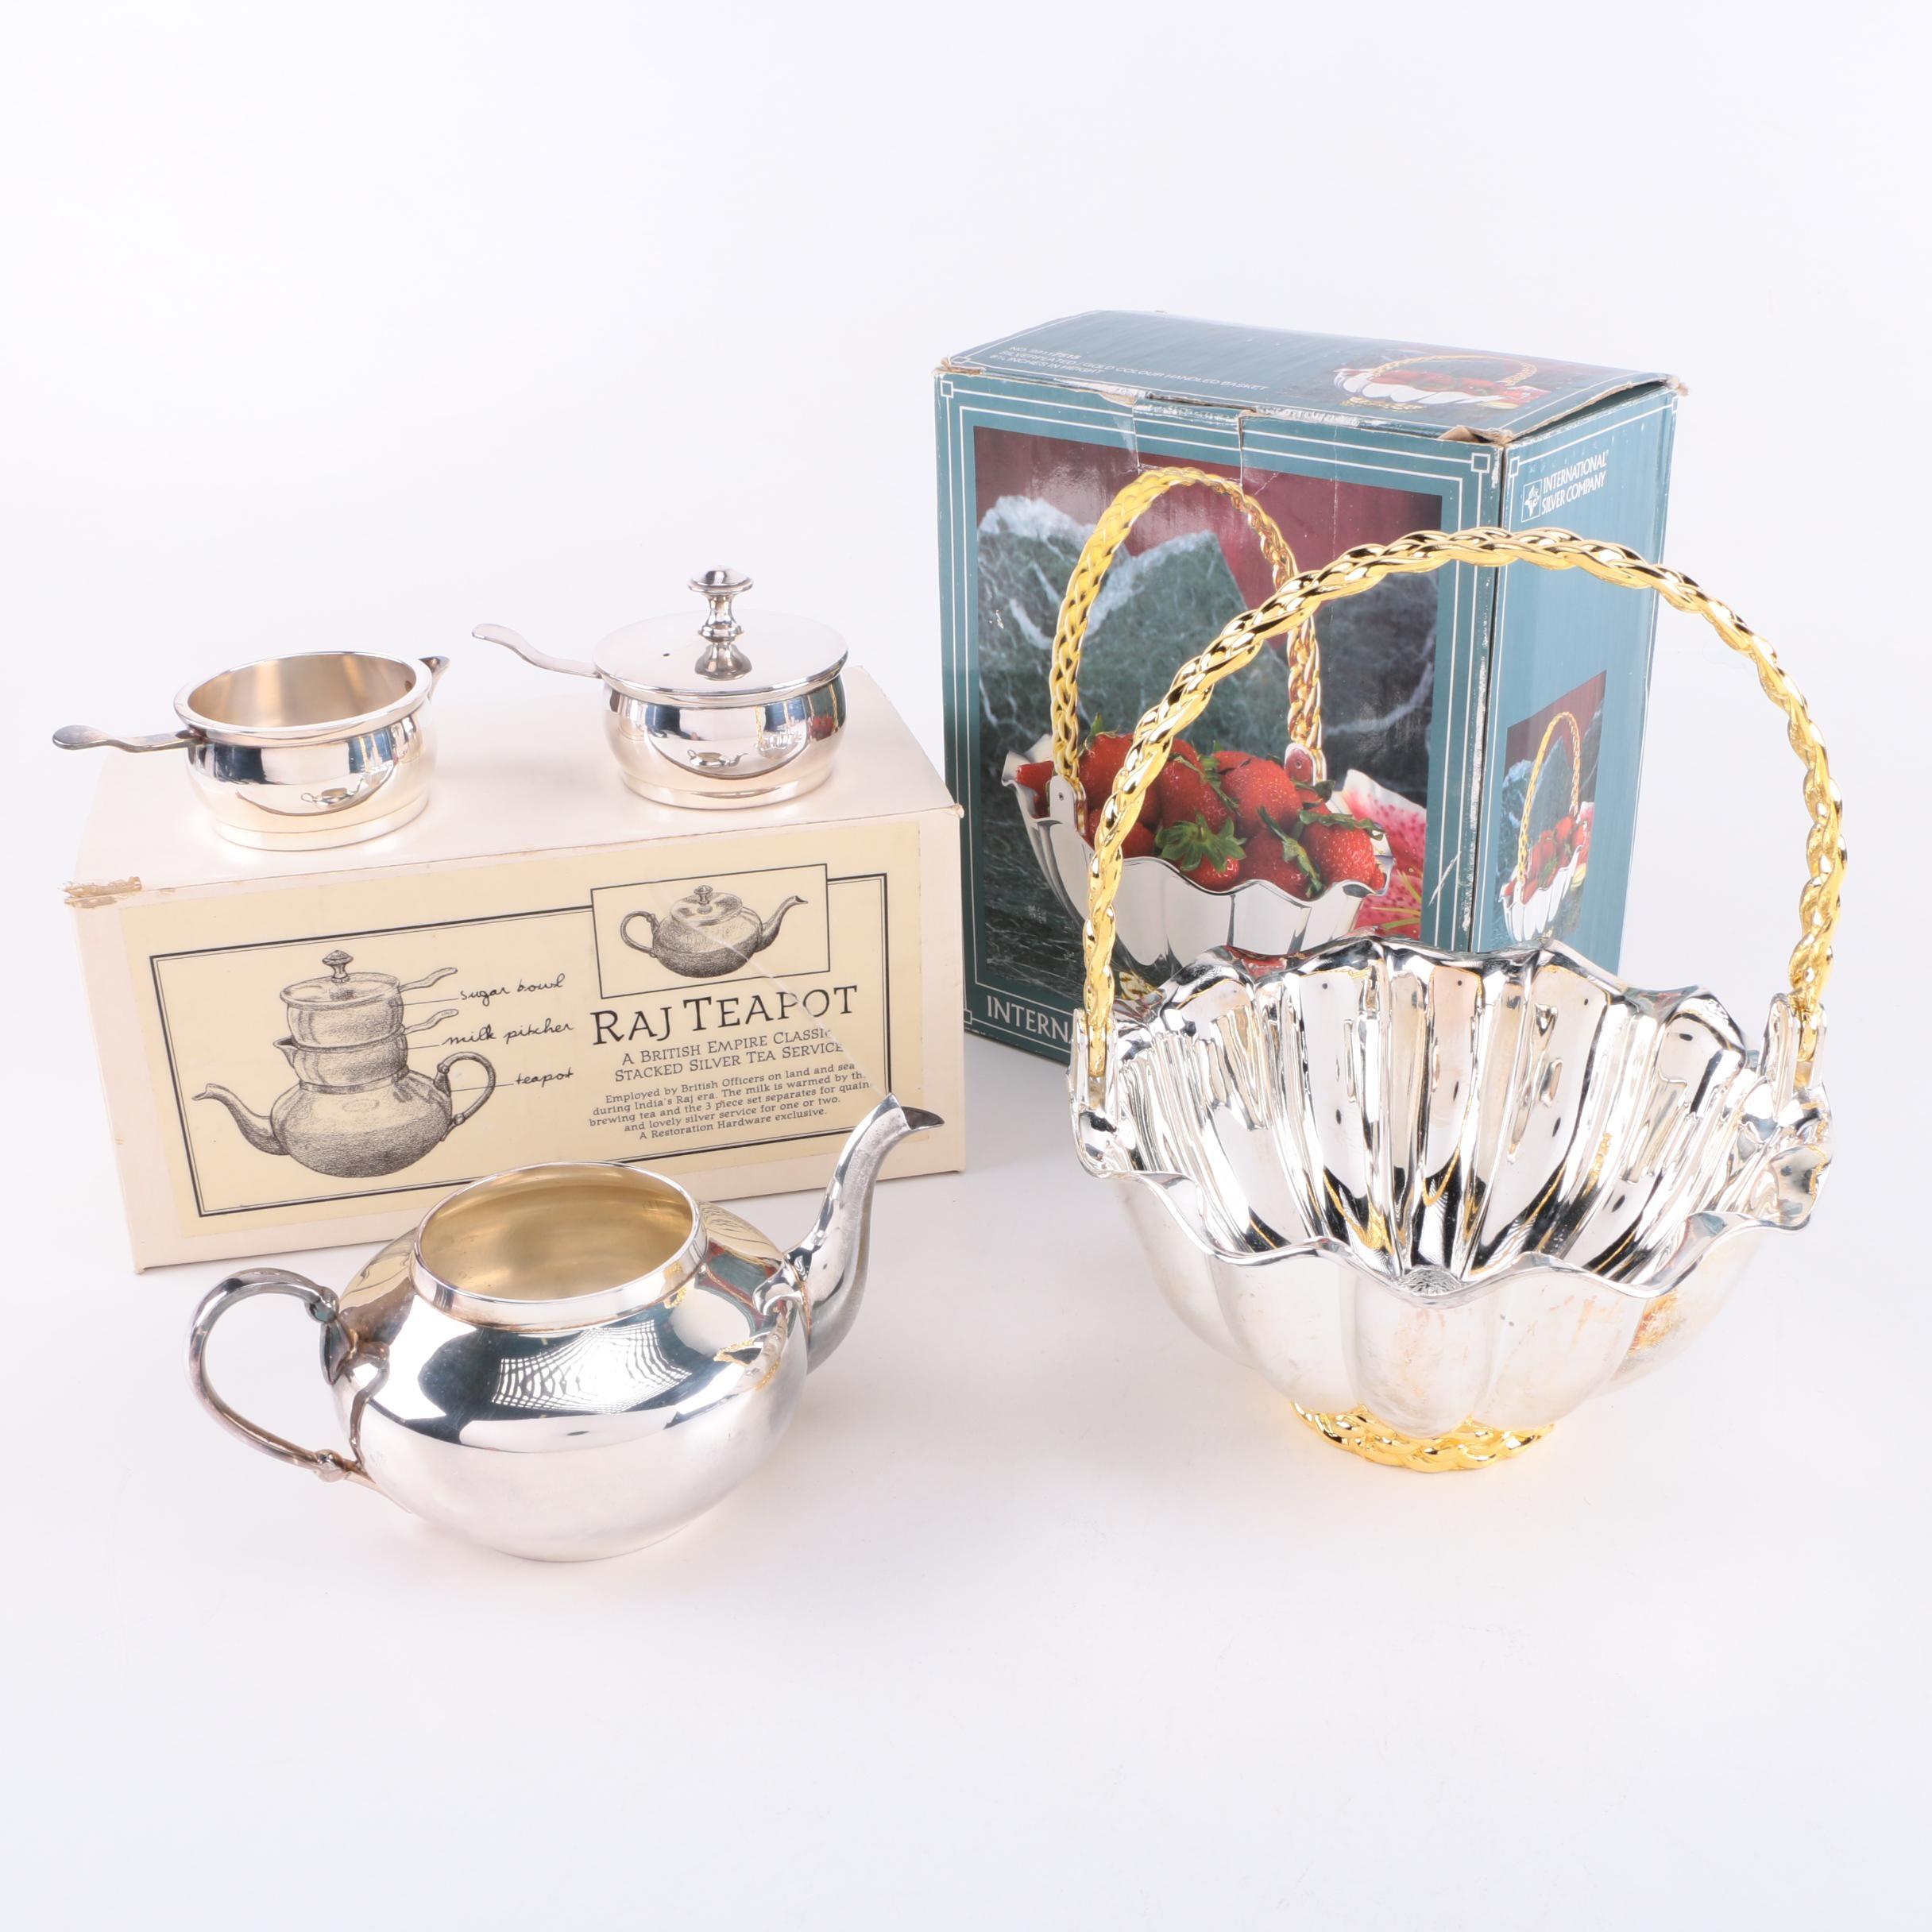 Raj Silver Plate Teapot and International Silver Co. Silver Plate Wedding Basket